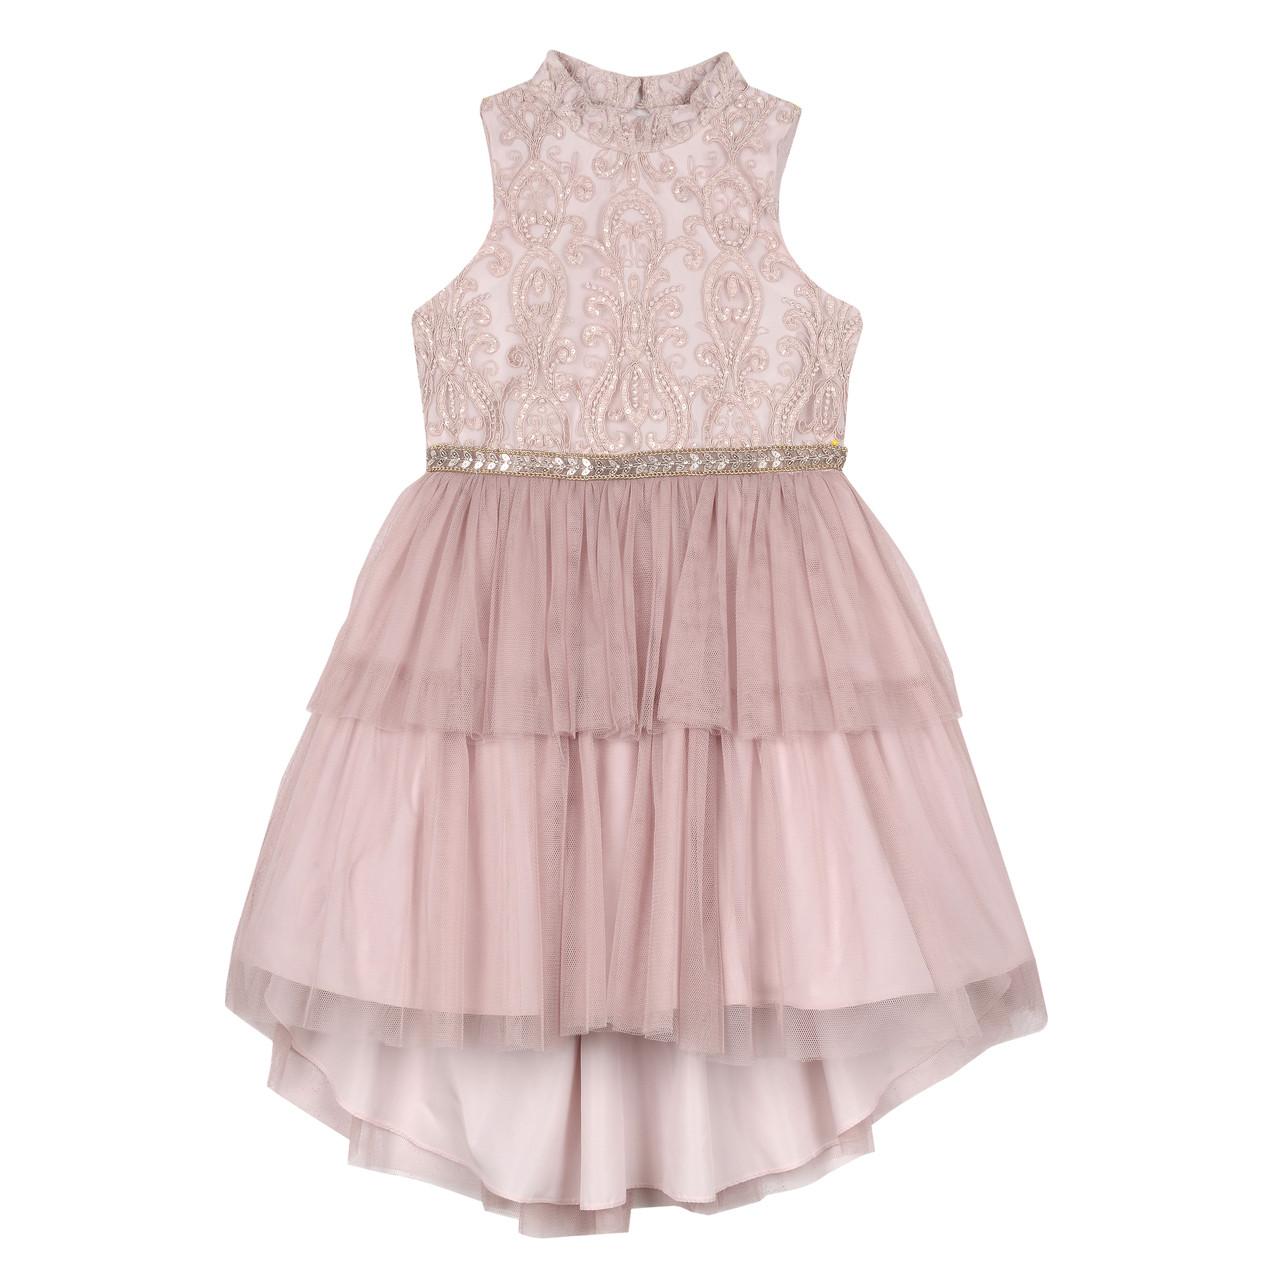 cc679dbc3a Embroidered 2 Tier Tutu Dress (Size 4-6X)